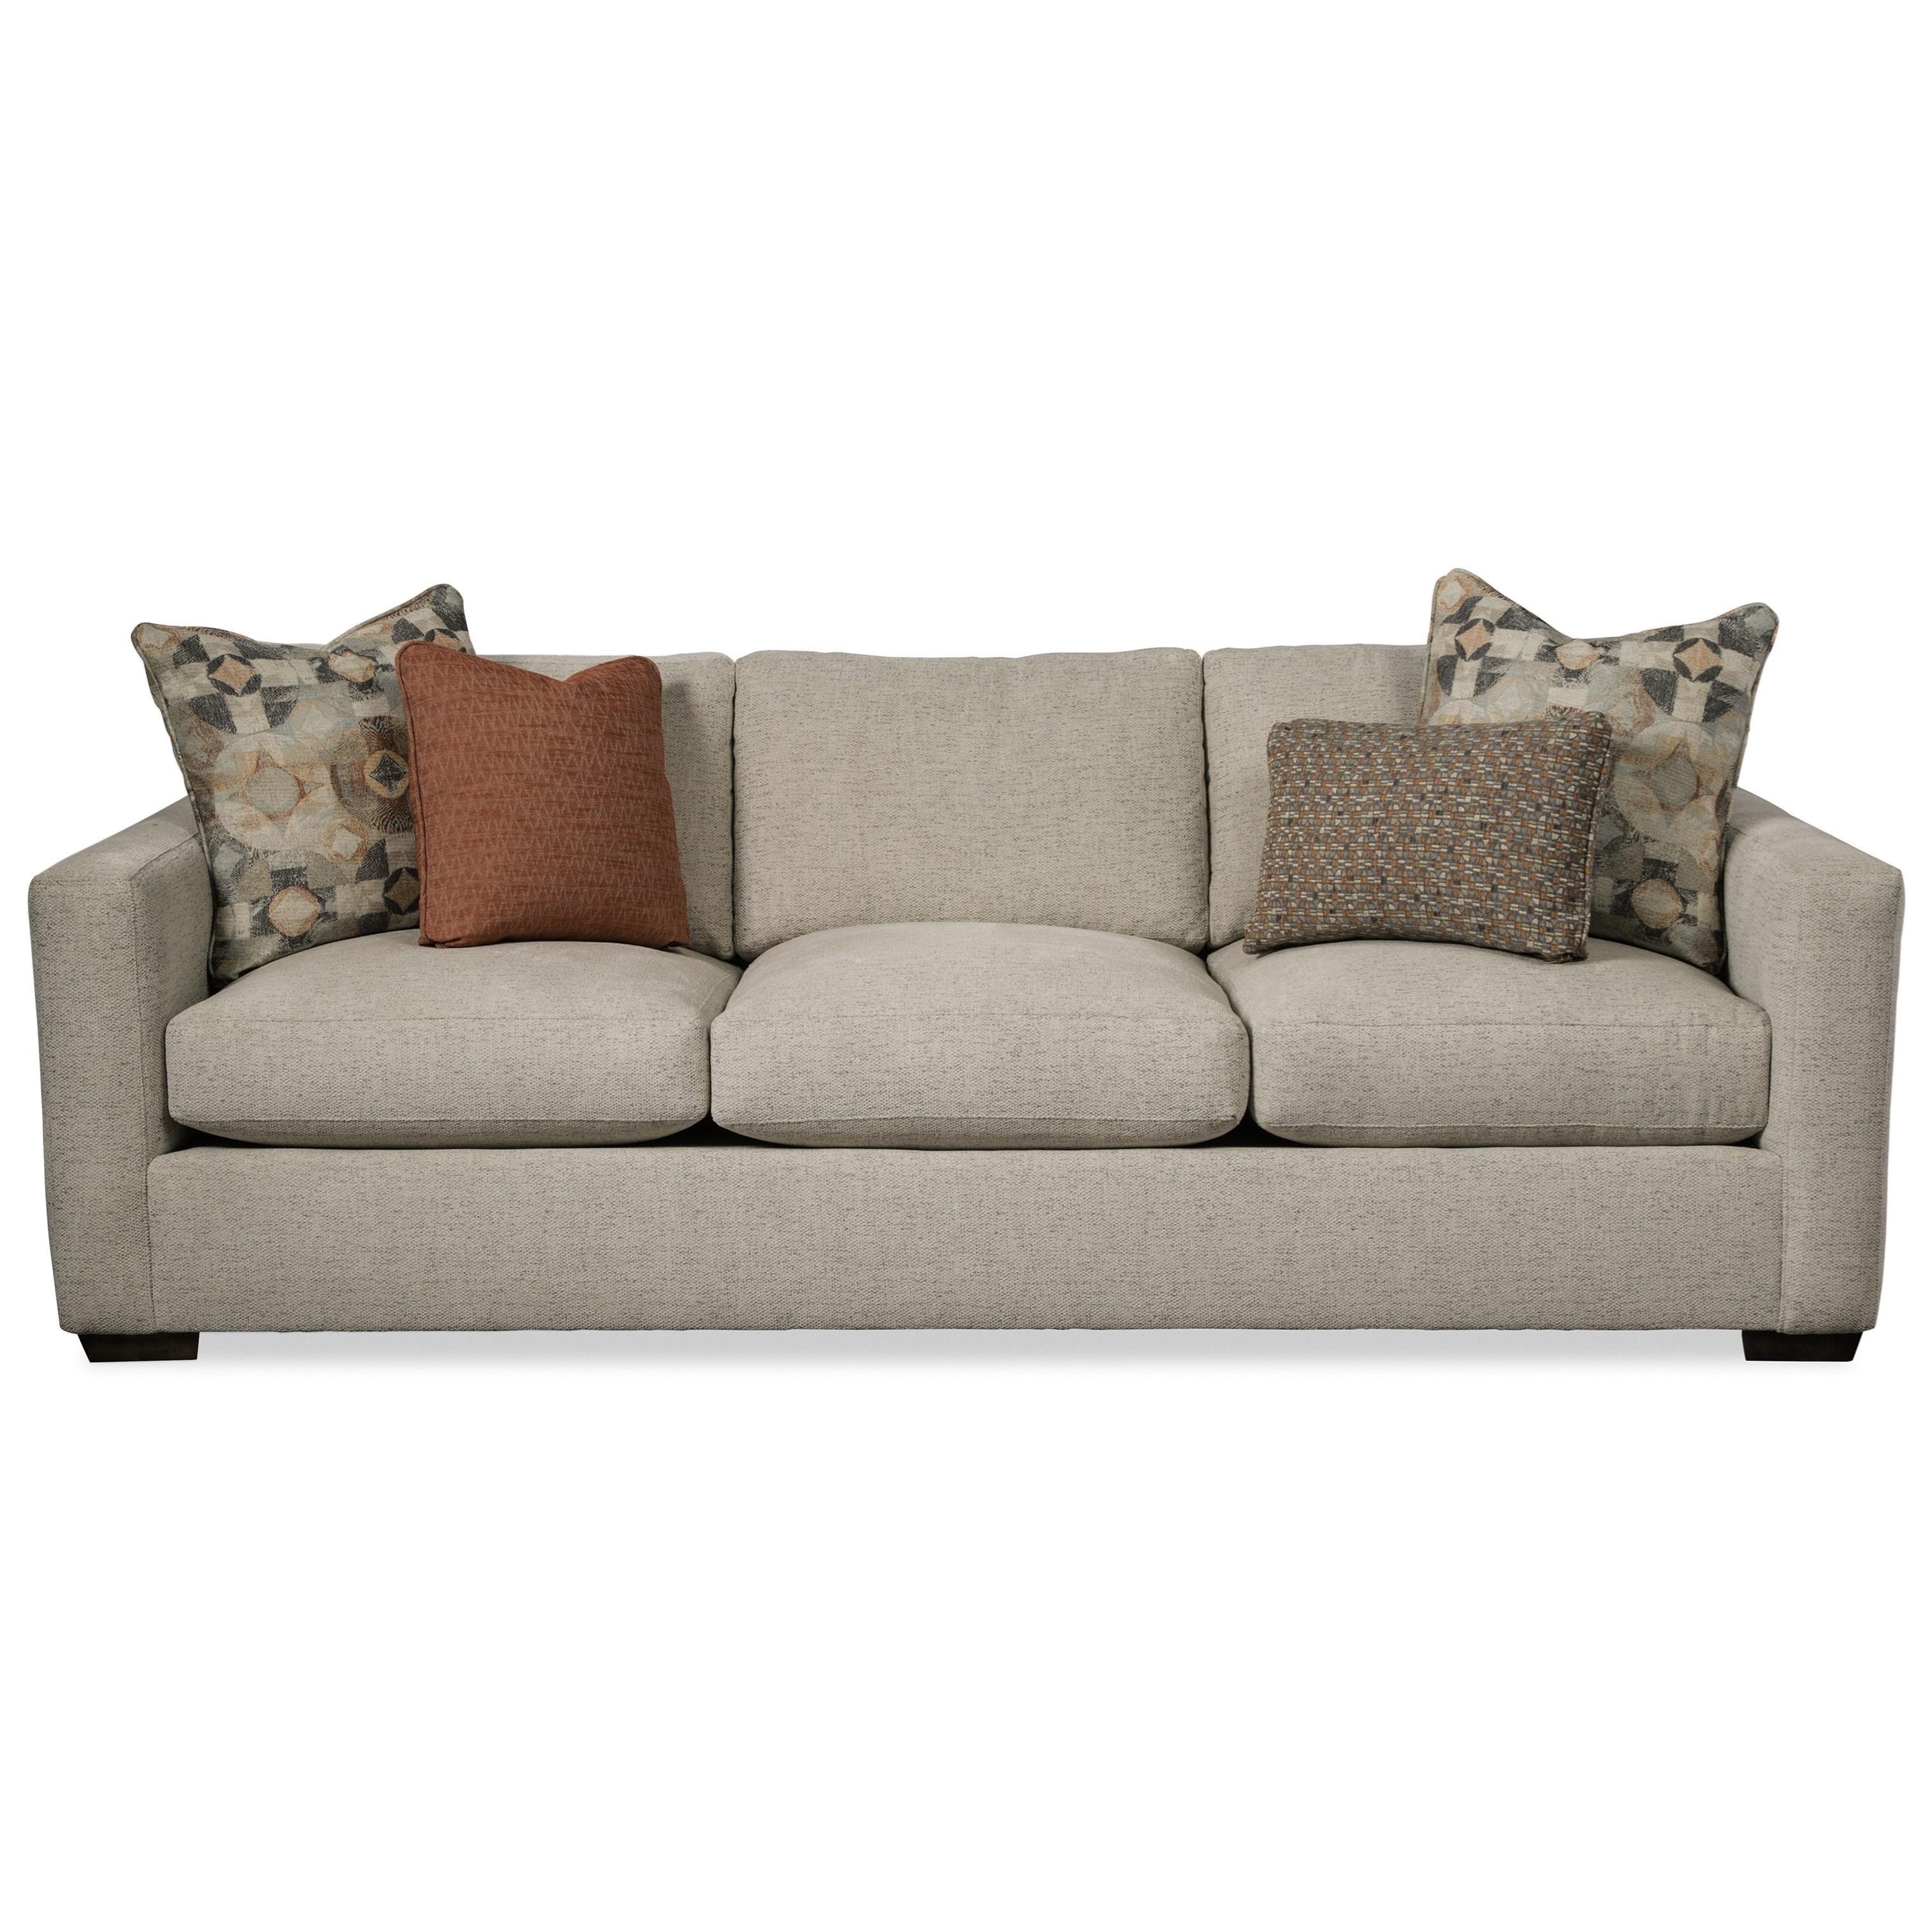 792750BD Sofa by Craftmaster at Baer's Furniture